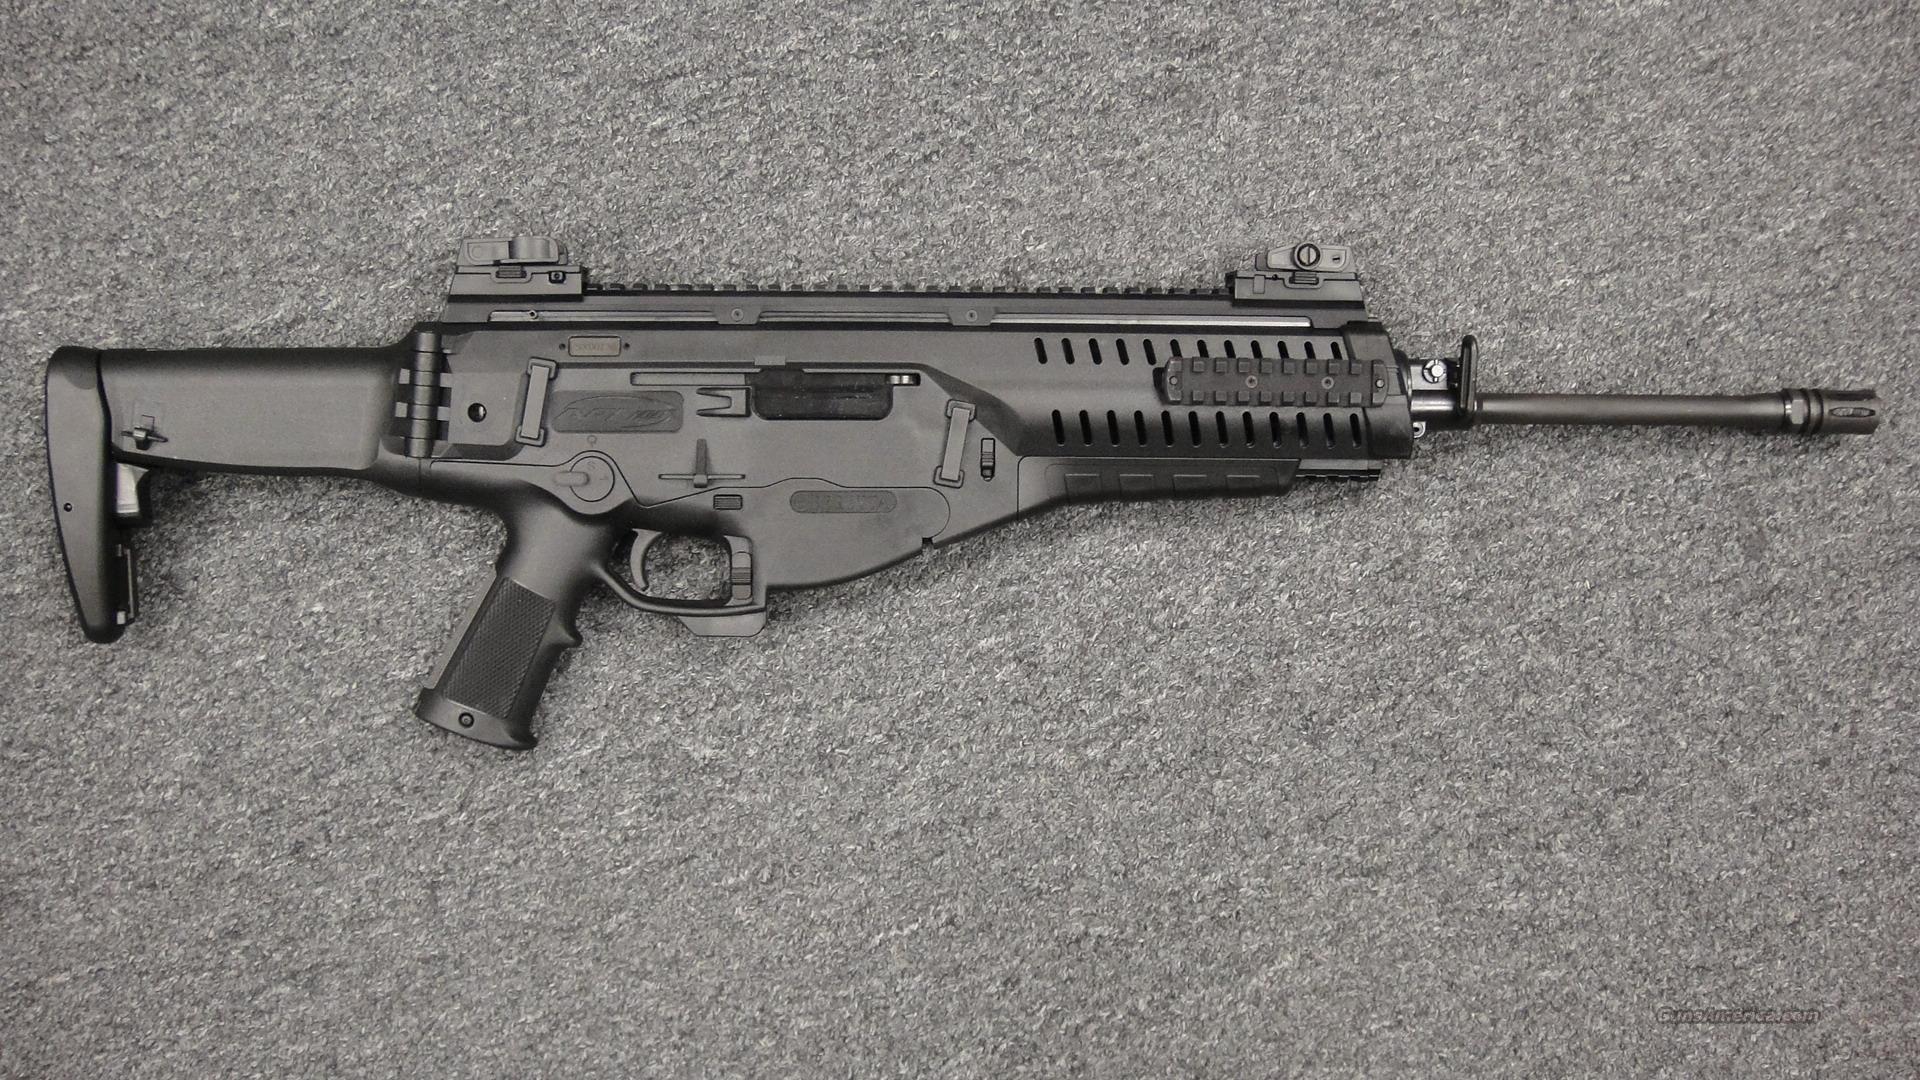 Beretta ARX-100 for sale